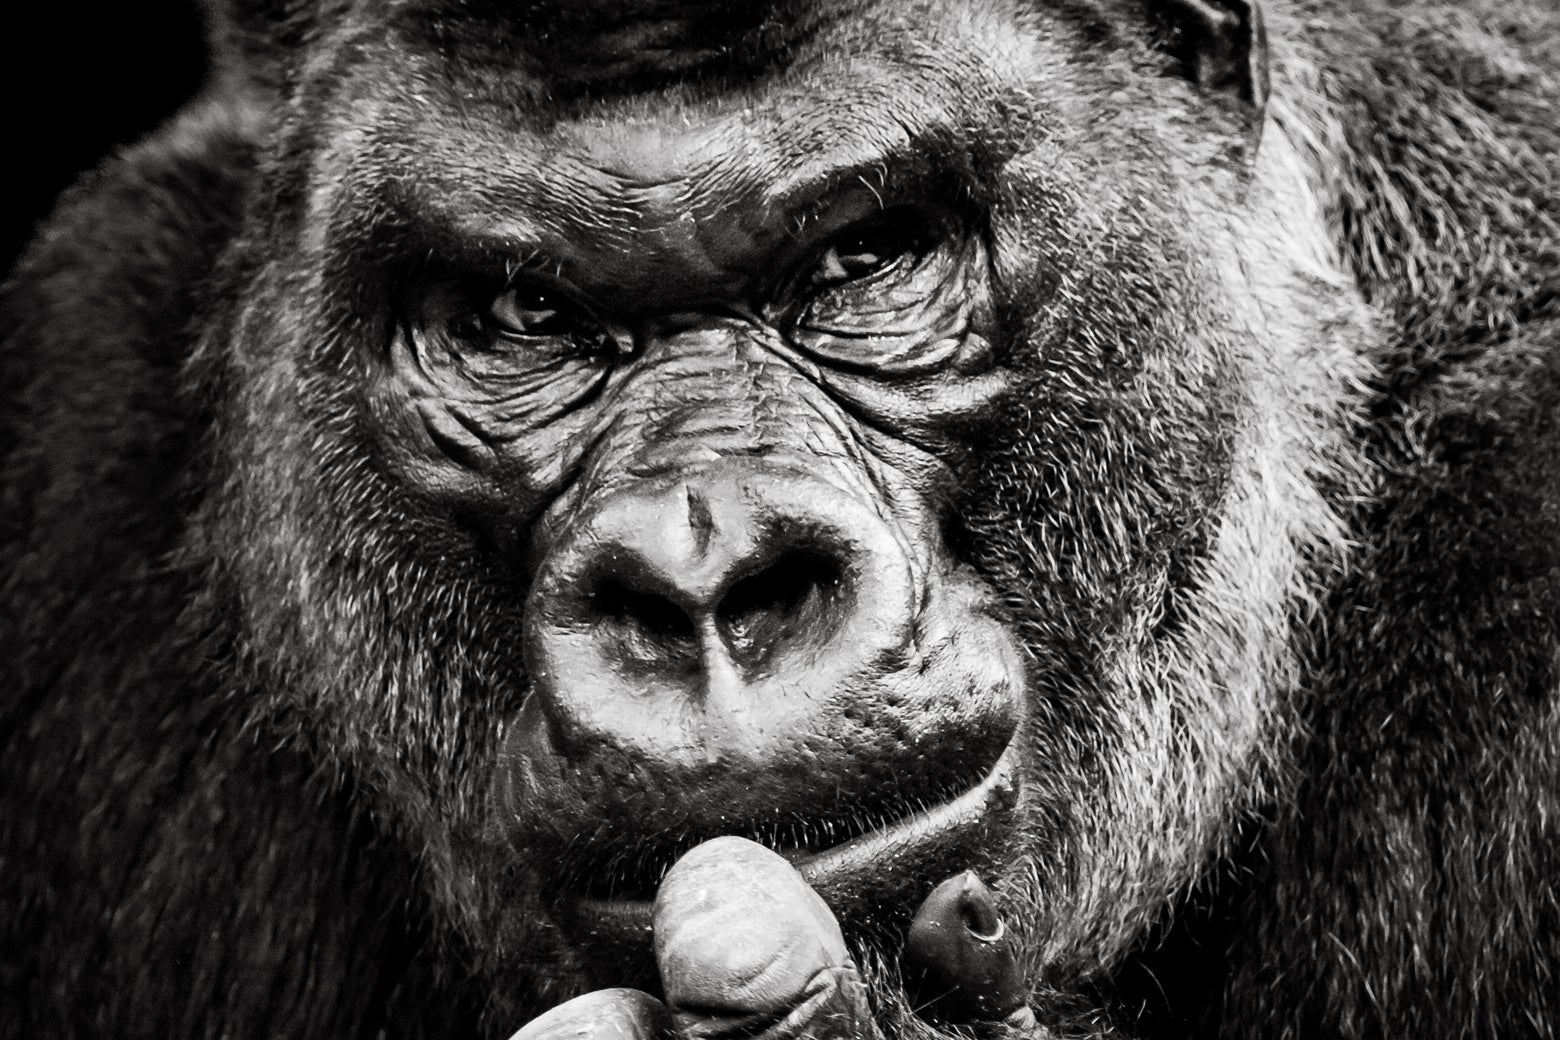 A Western lowland gorilla.